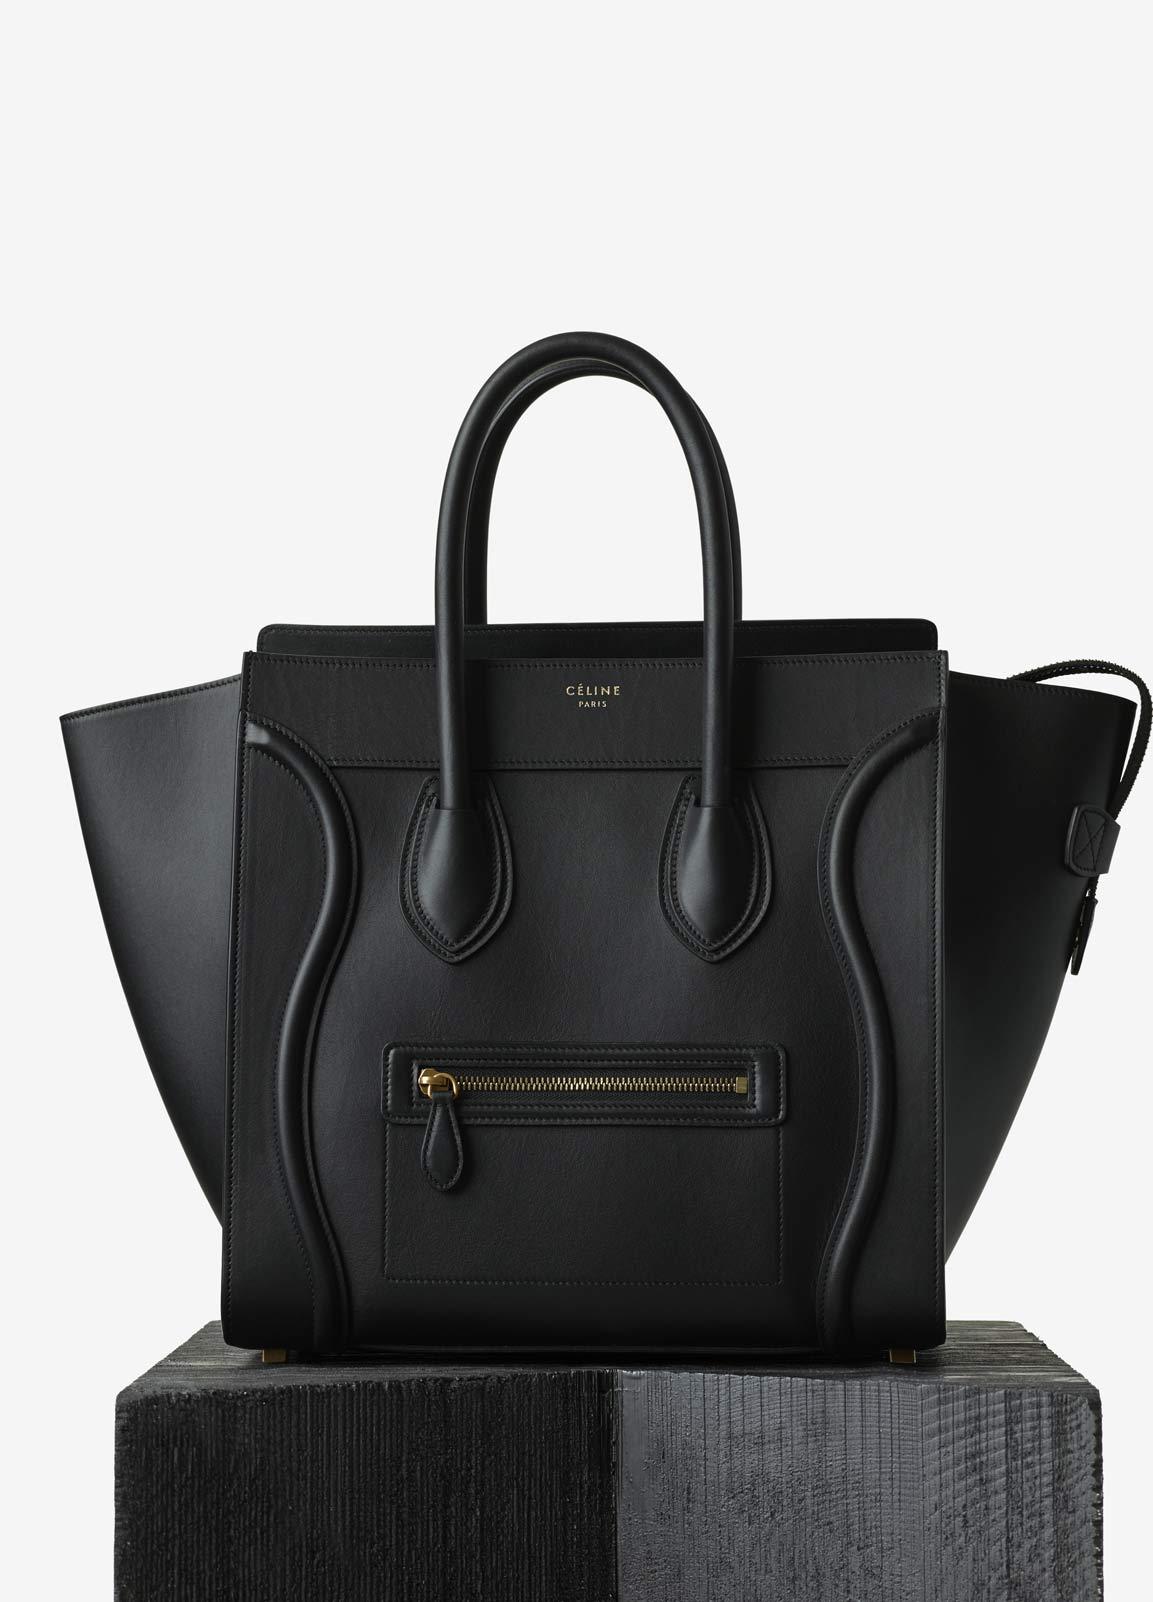 Replica Celine Handbags, Celine Fake Bags ...